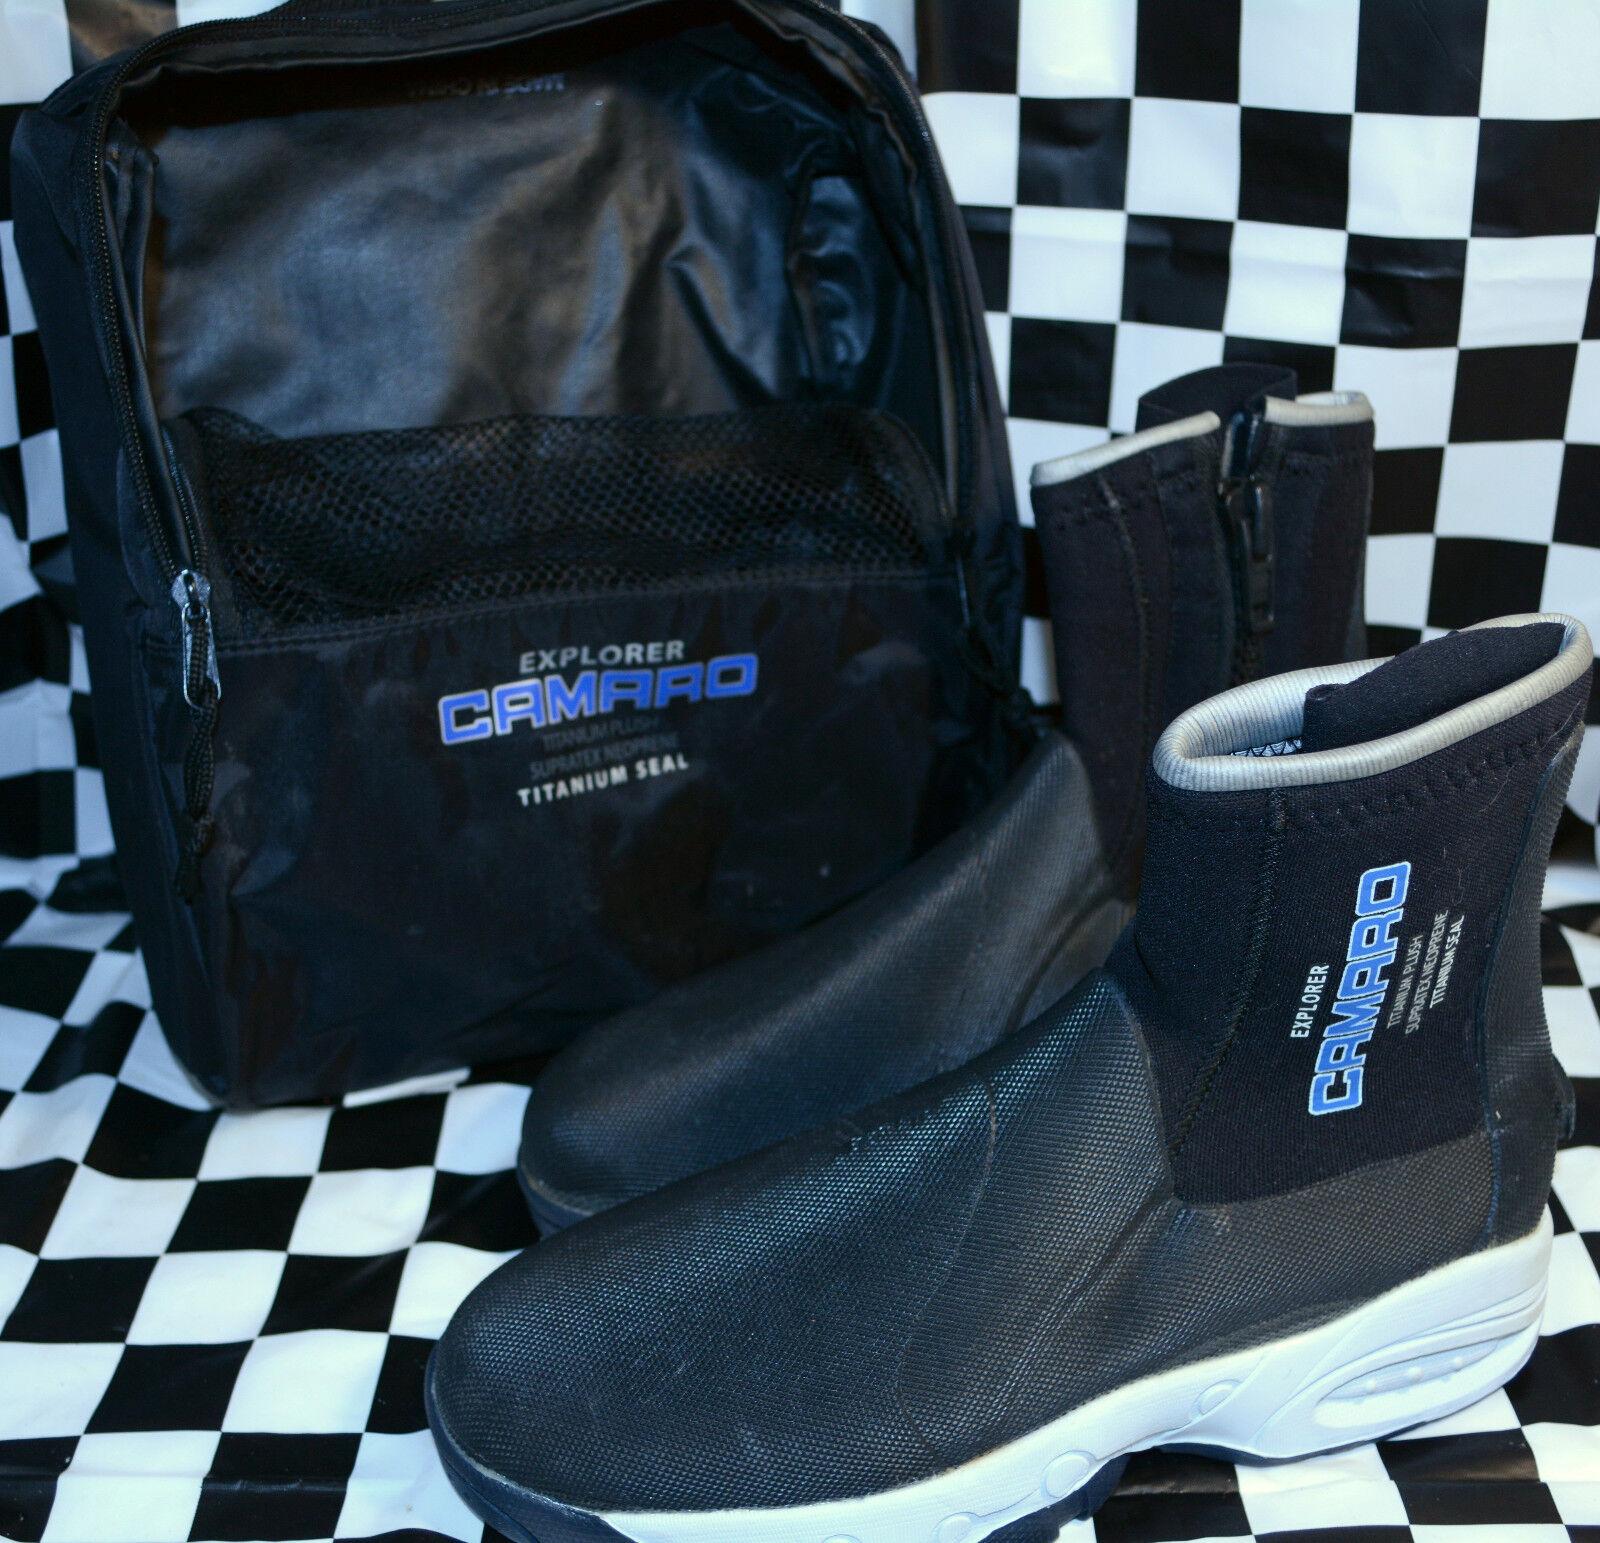 Camaro Explorer Hard Sole Dive Boots Titanium with Storage Bag NEW size 40